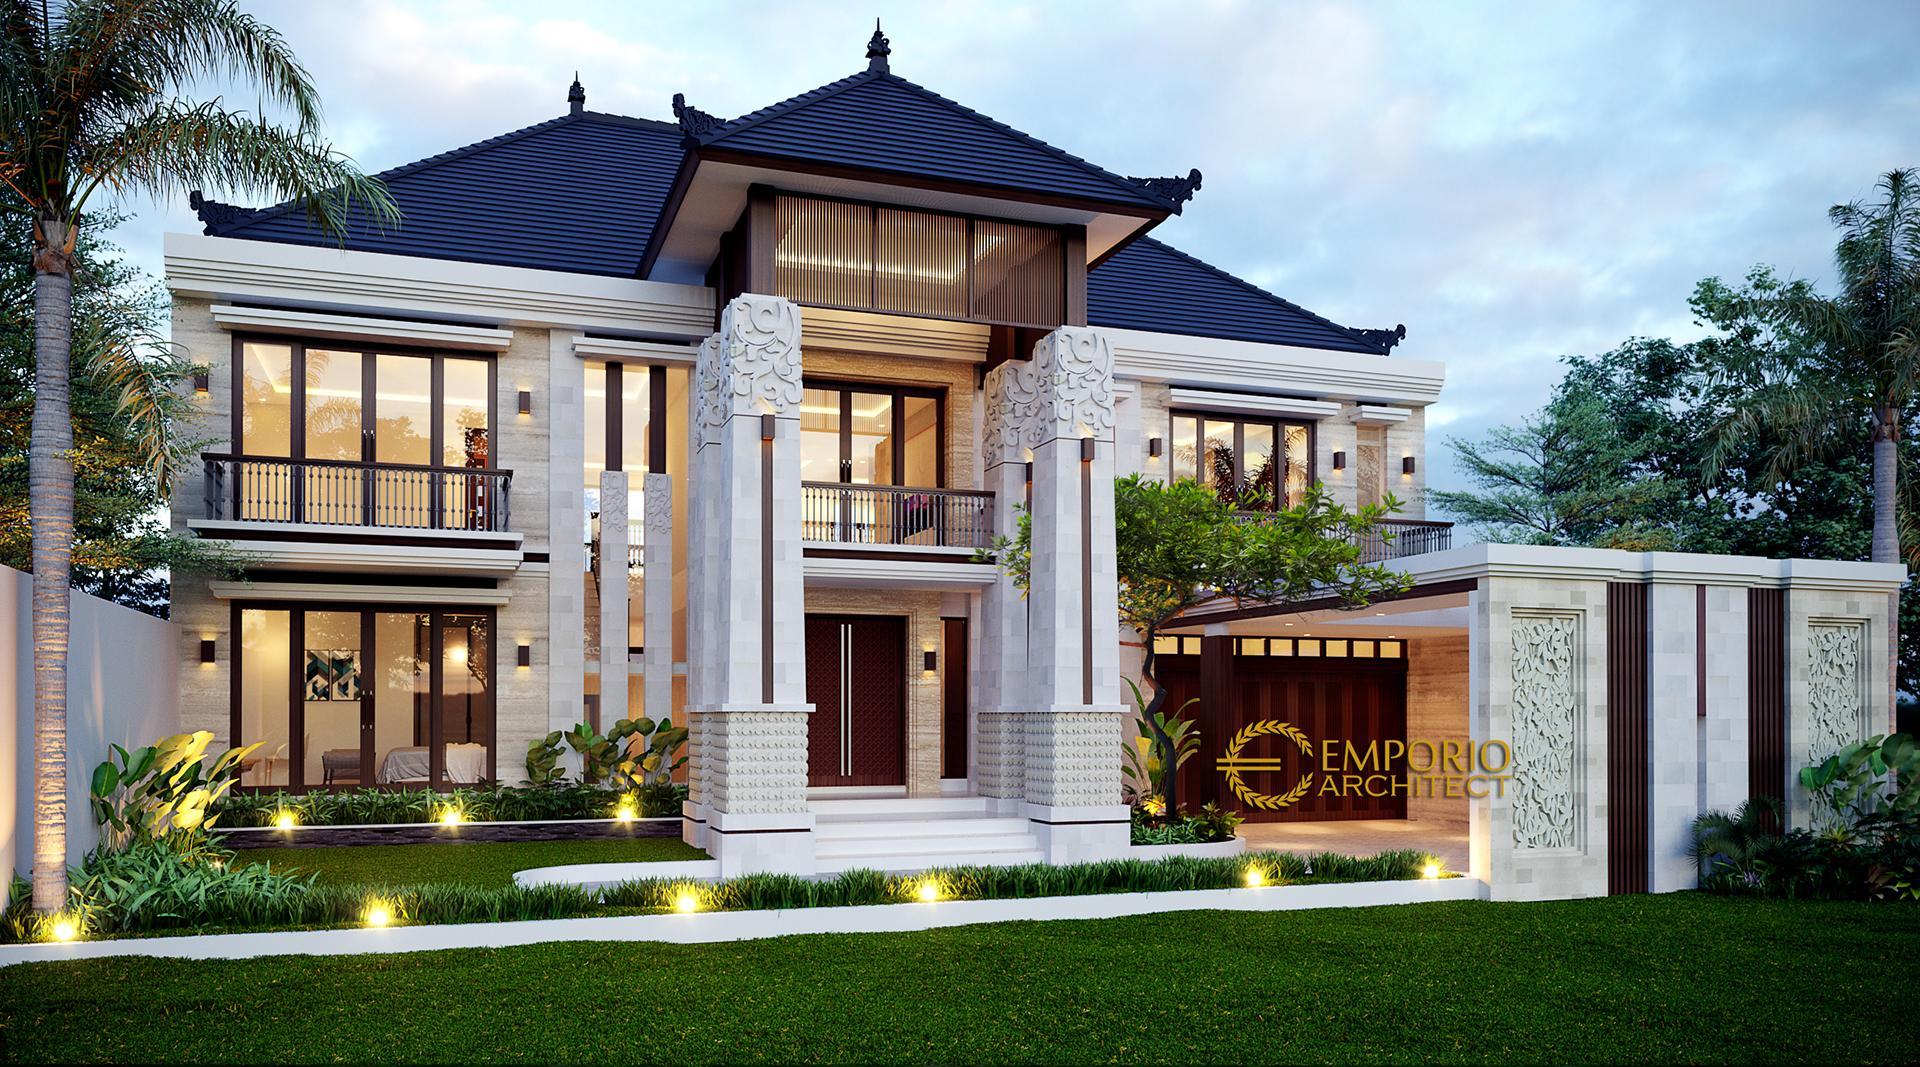 Mrs. Widi Villa Bali House 2 Floors Design - Bandung, Jawa Barat